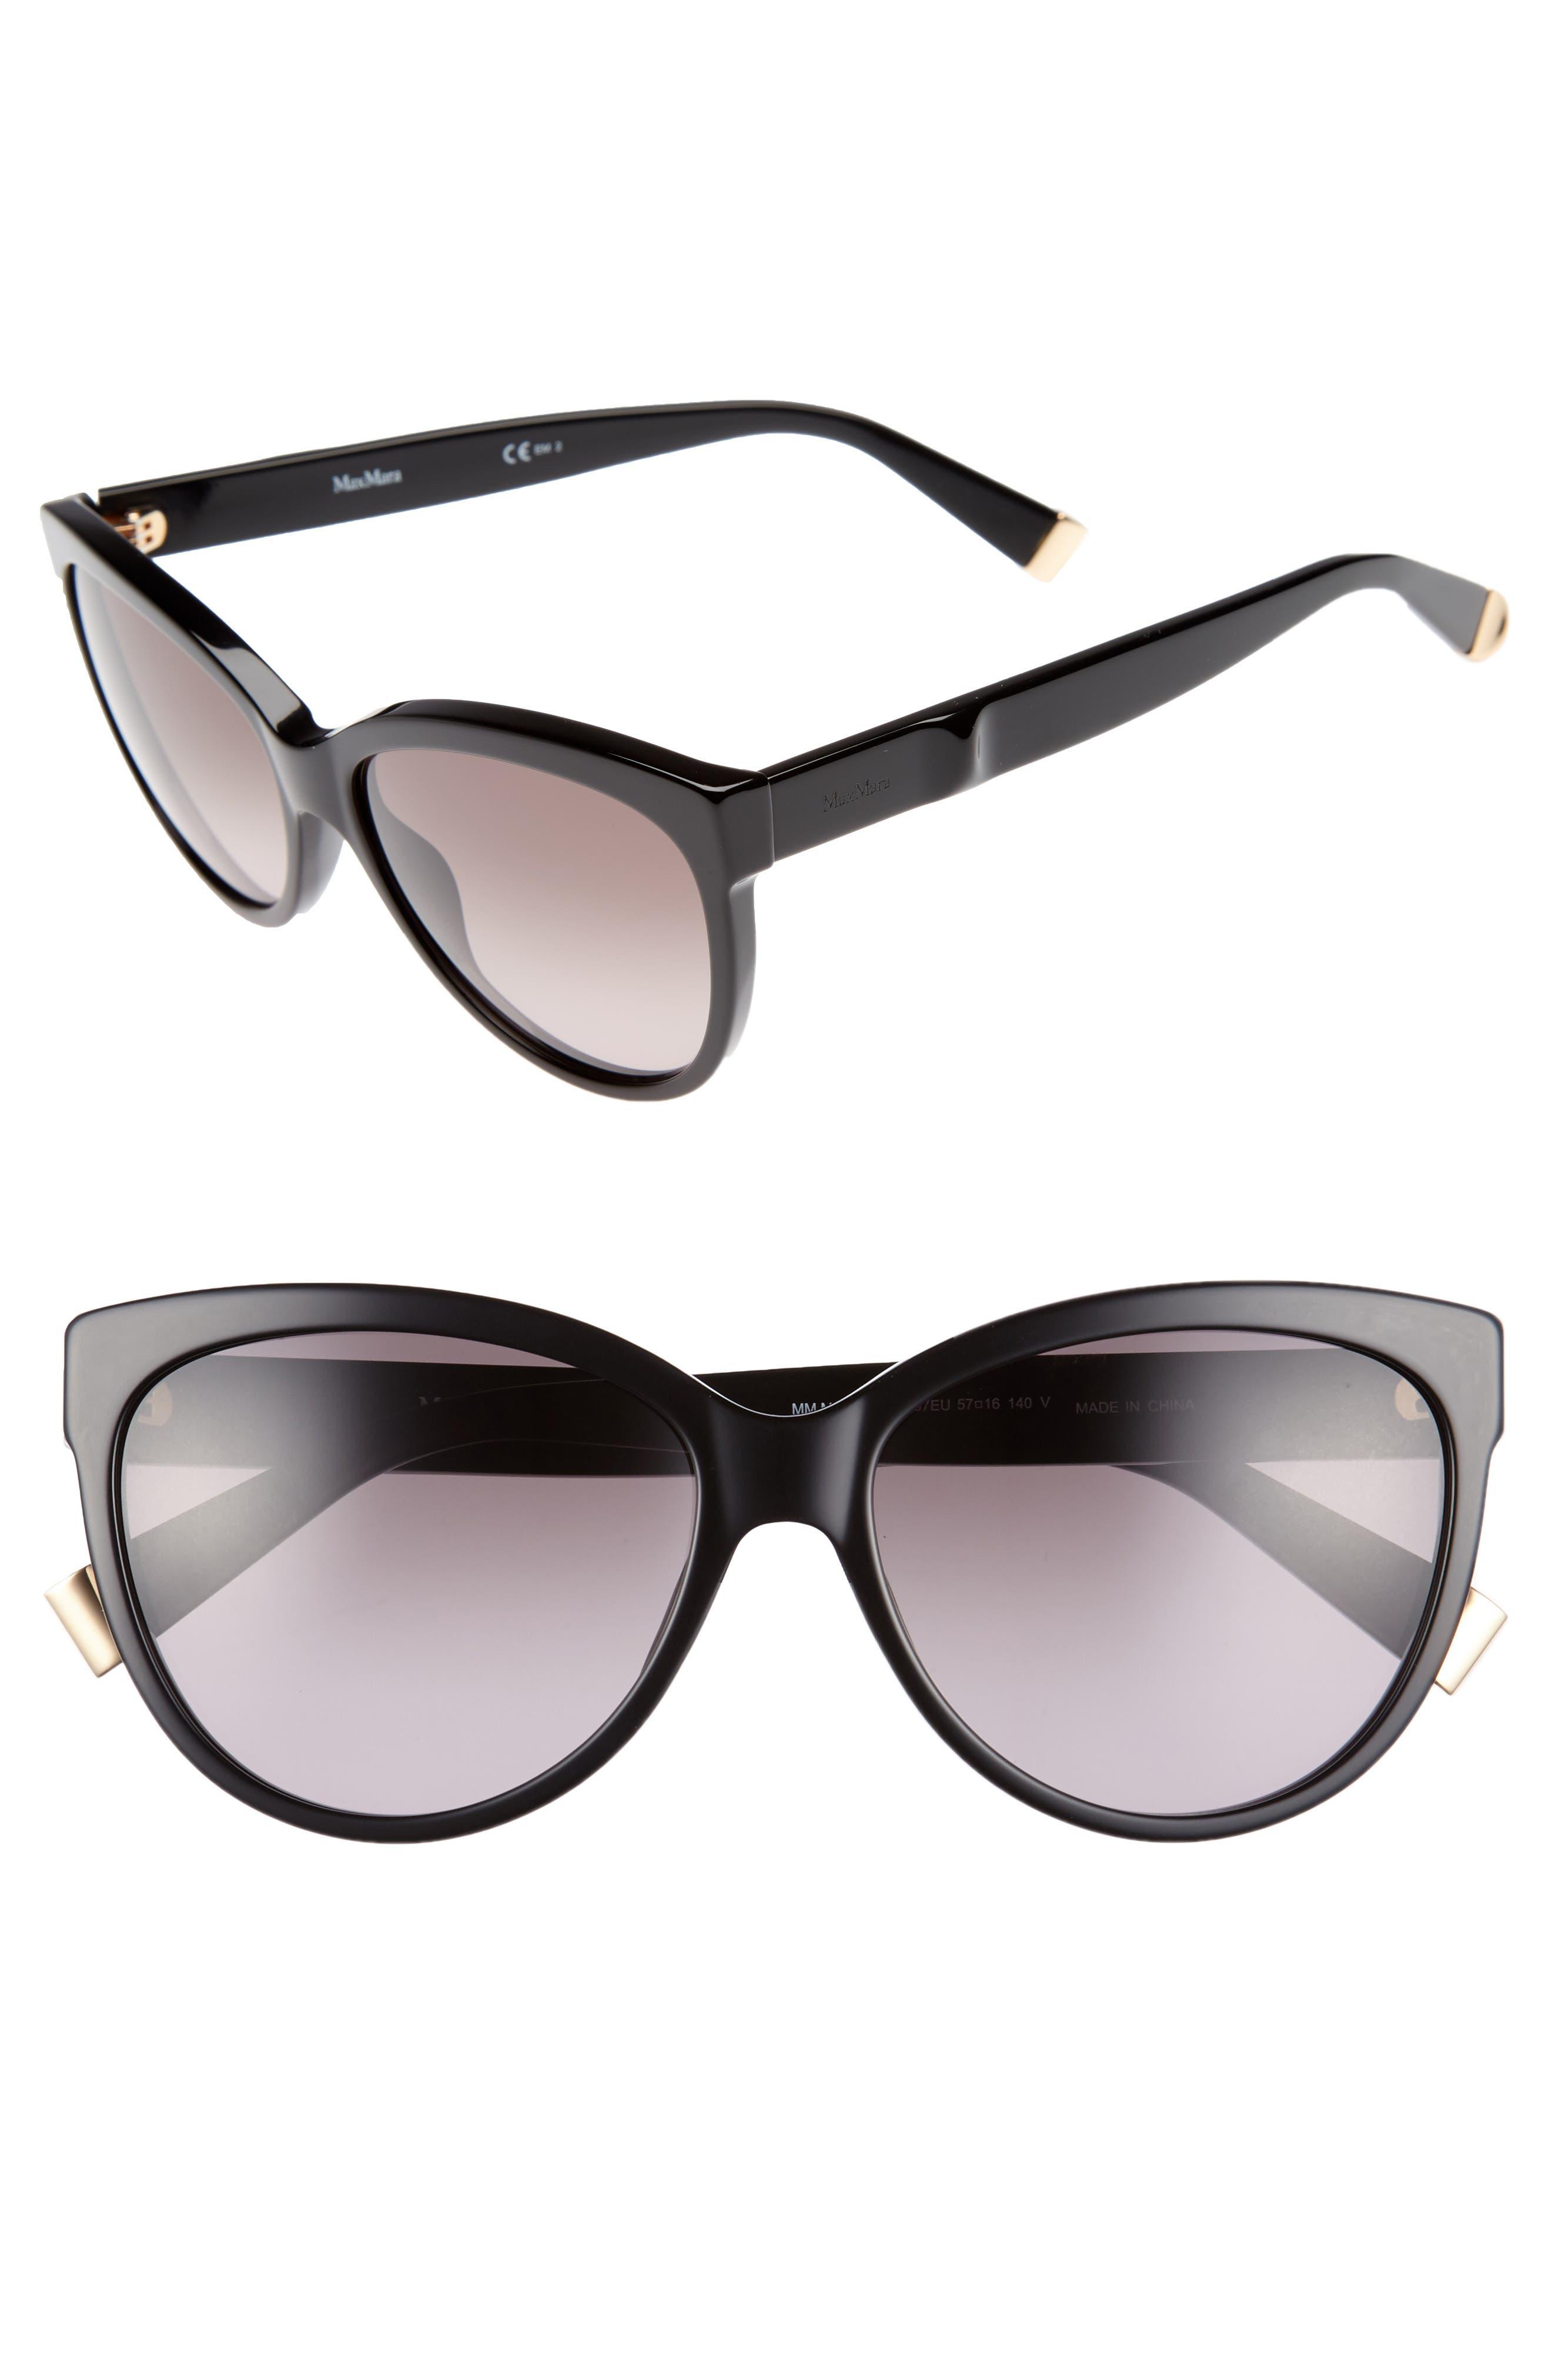 Moderii 57mm Gradient Cat Eye Sunglasses,                             Main thumbnail 1, color,